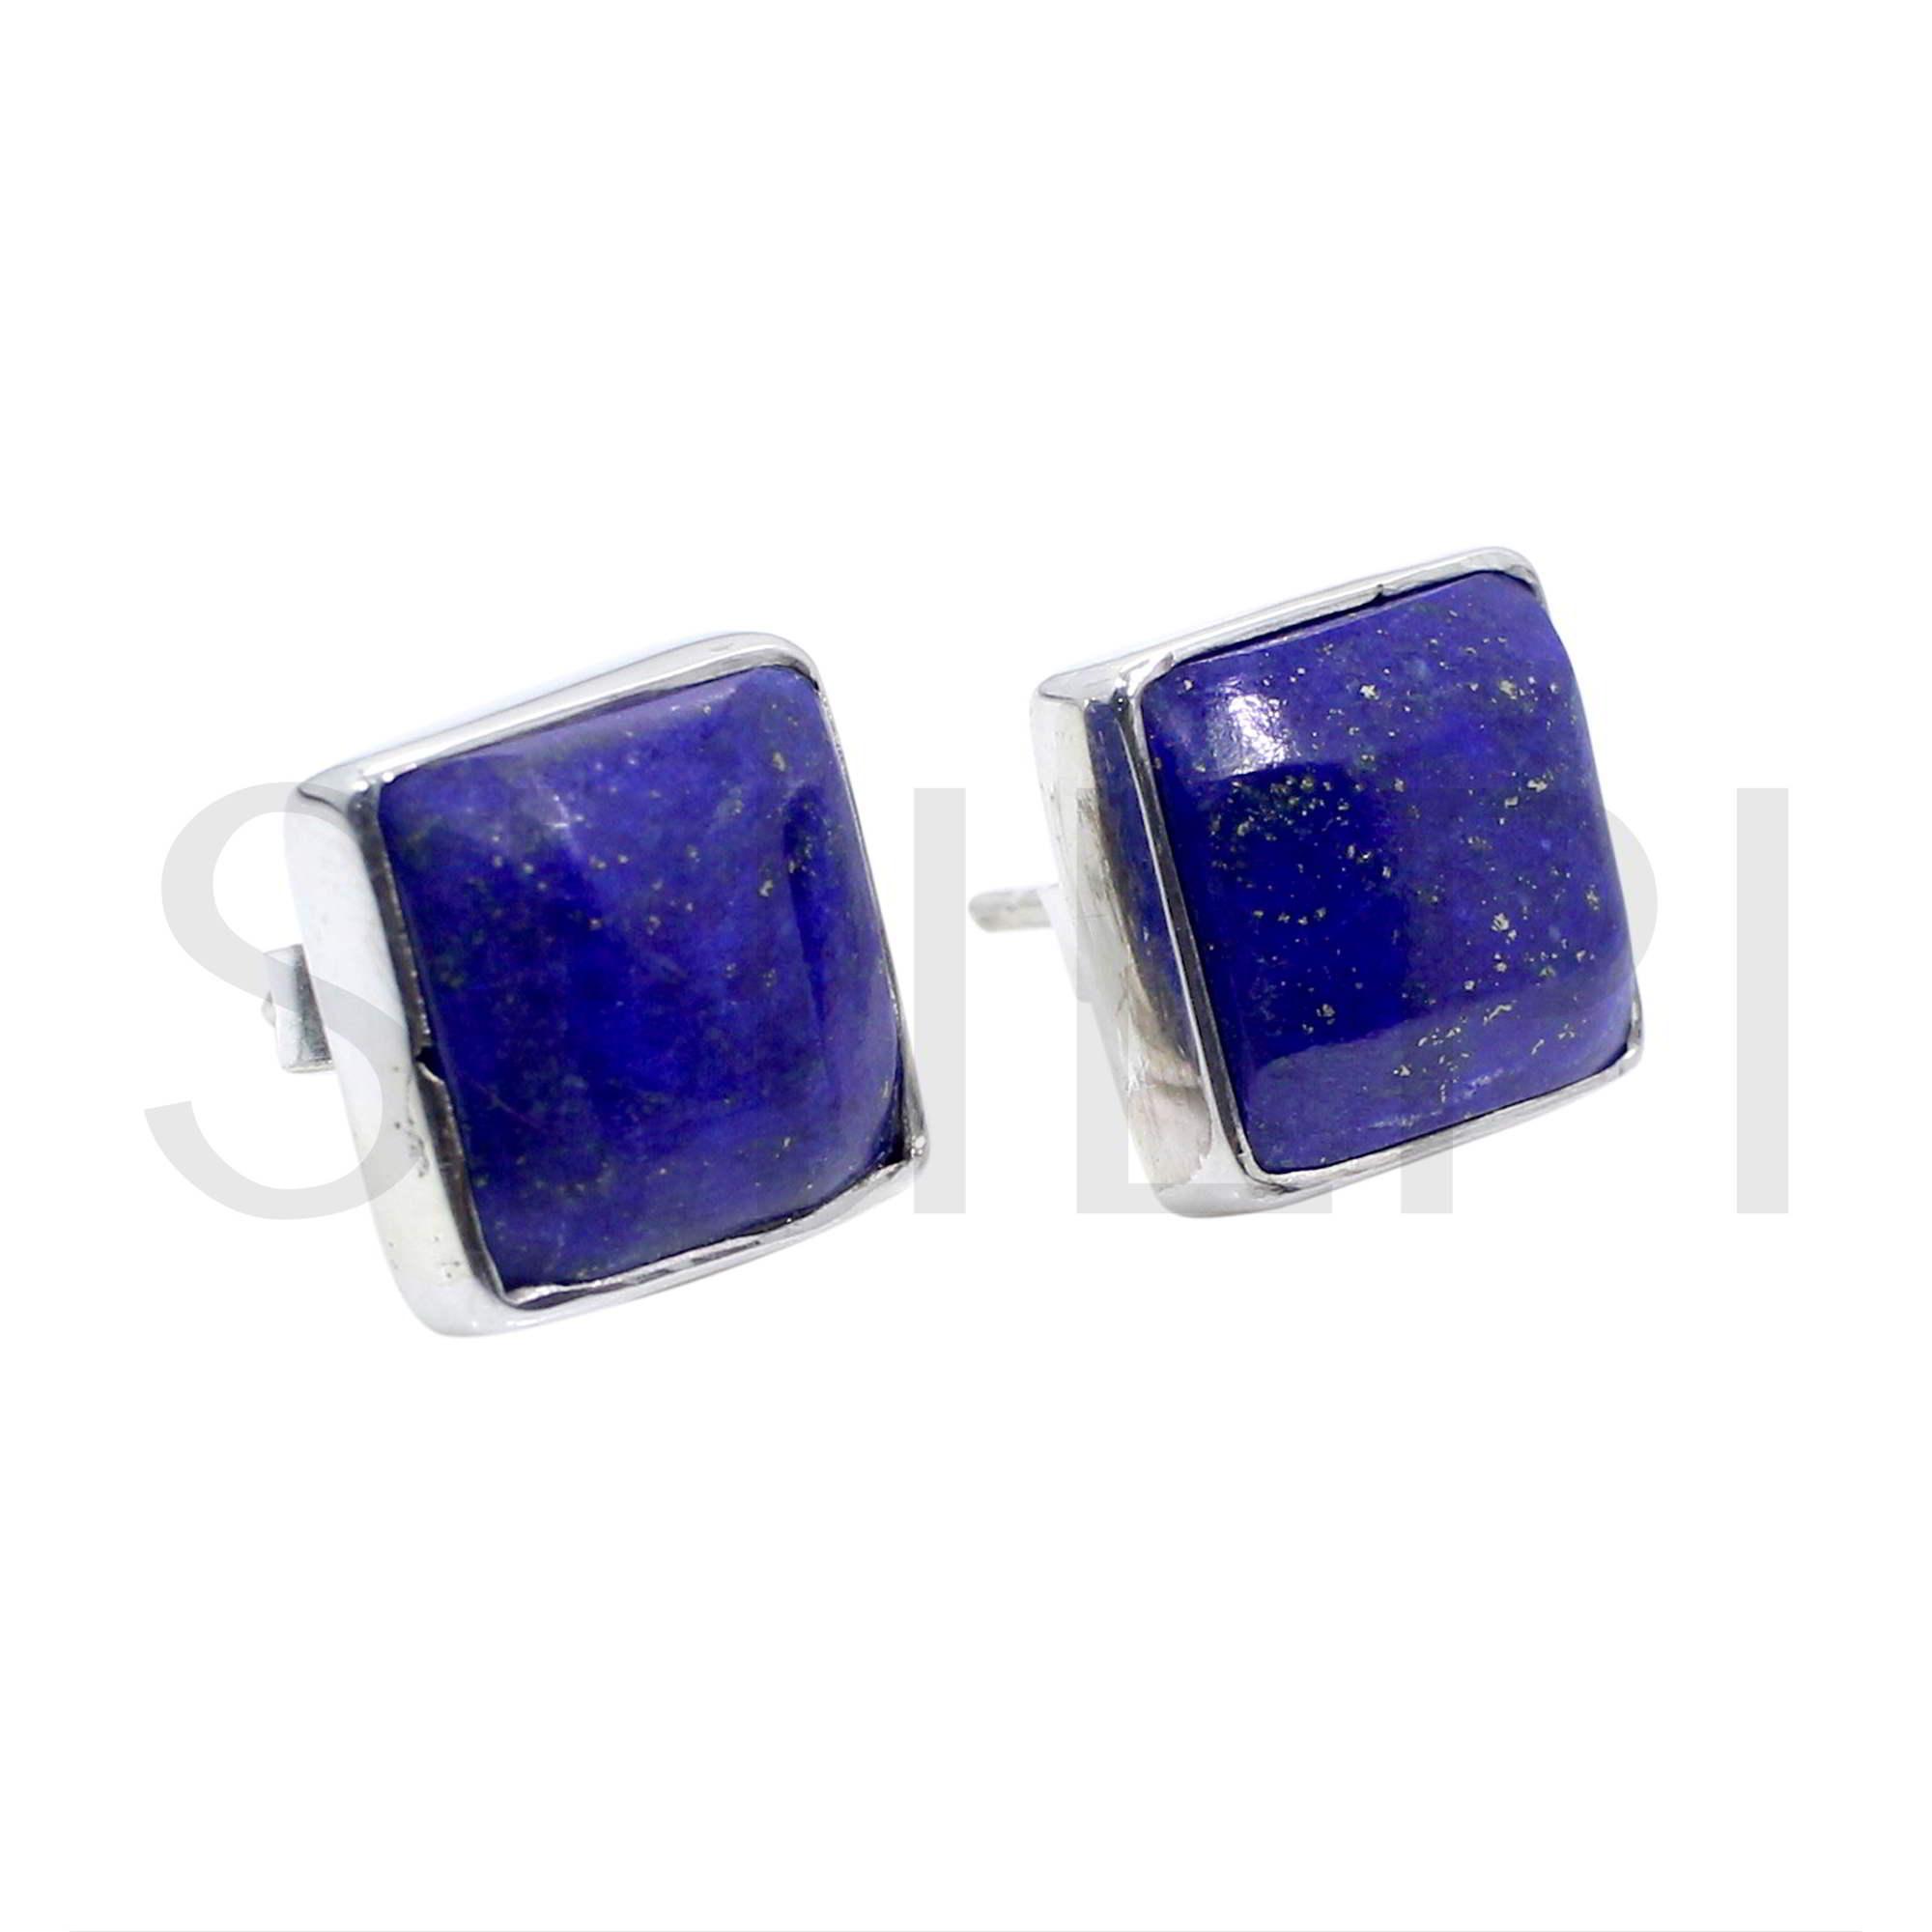 Natural Lapis Lazuli 925 Sterling Silver Stud Earrings